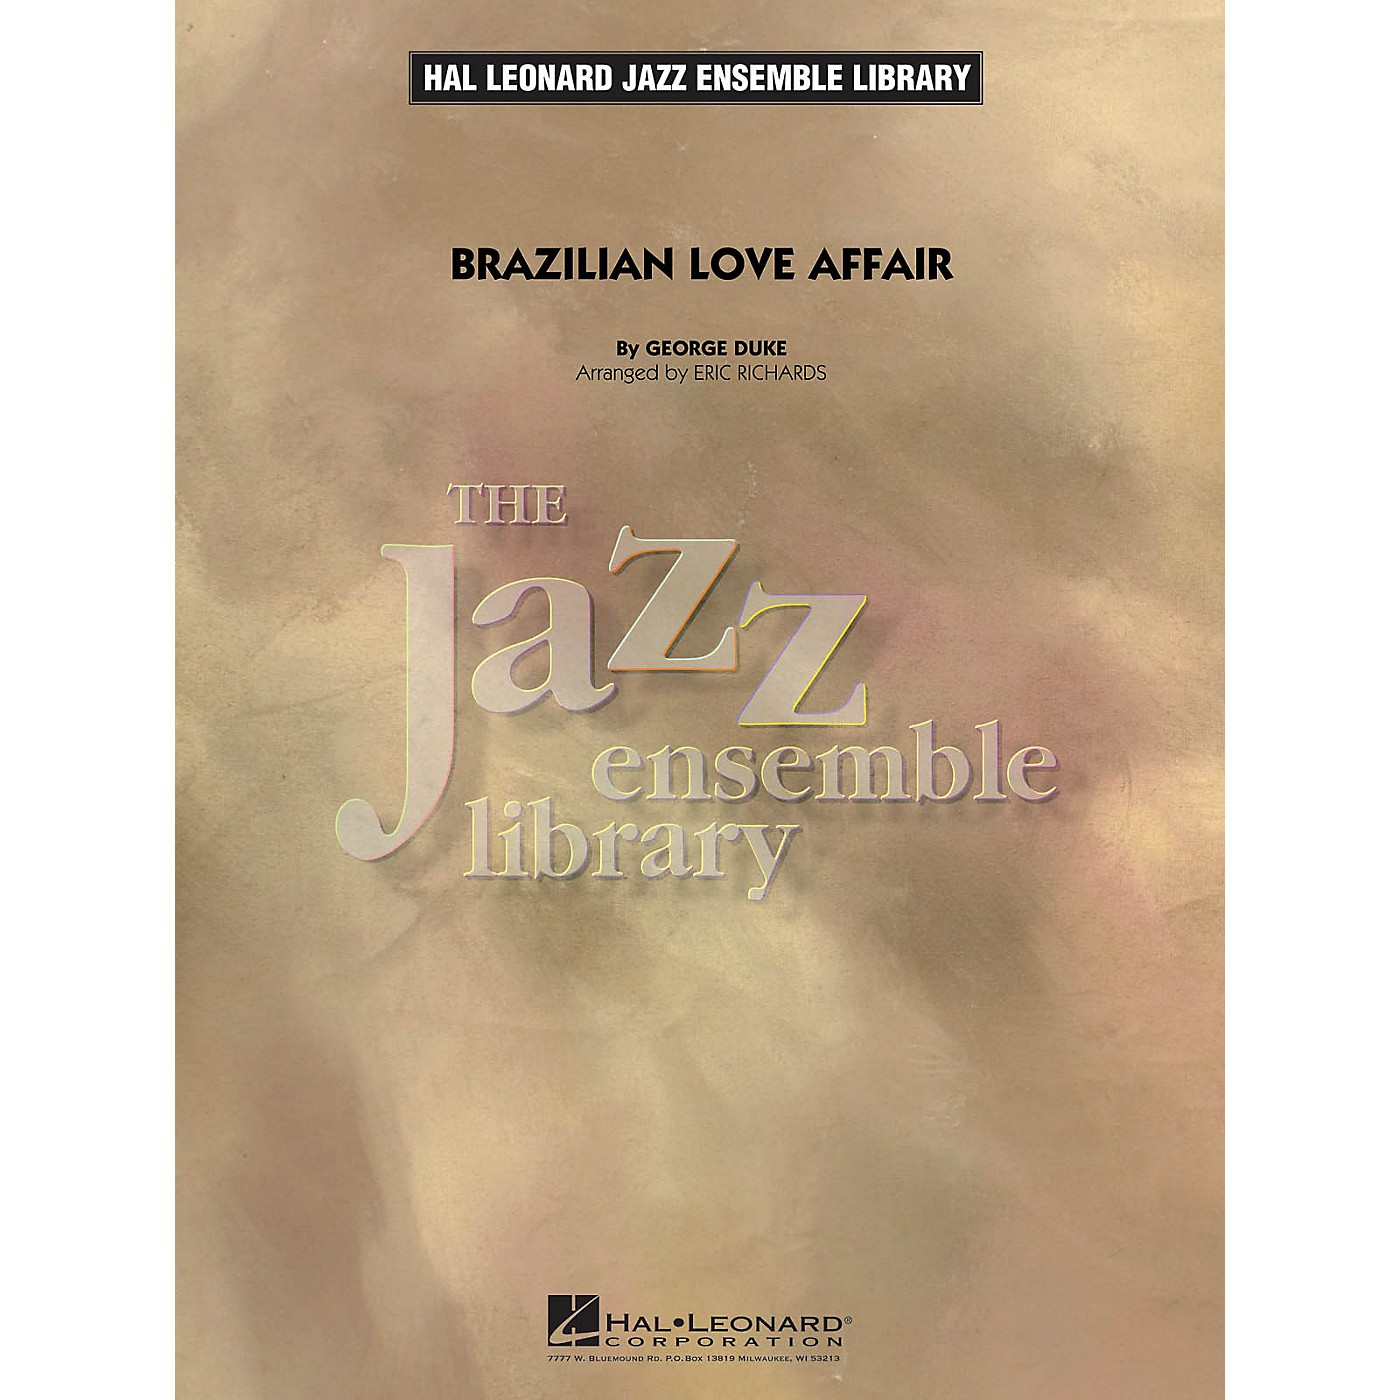 Hal Leonard Brazilian Love Affair Jazz Band Level 4 Arranged by Eric Richards thumbnail